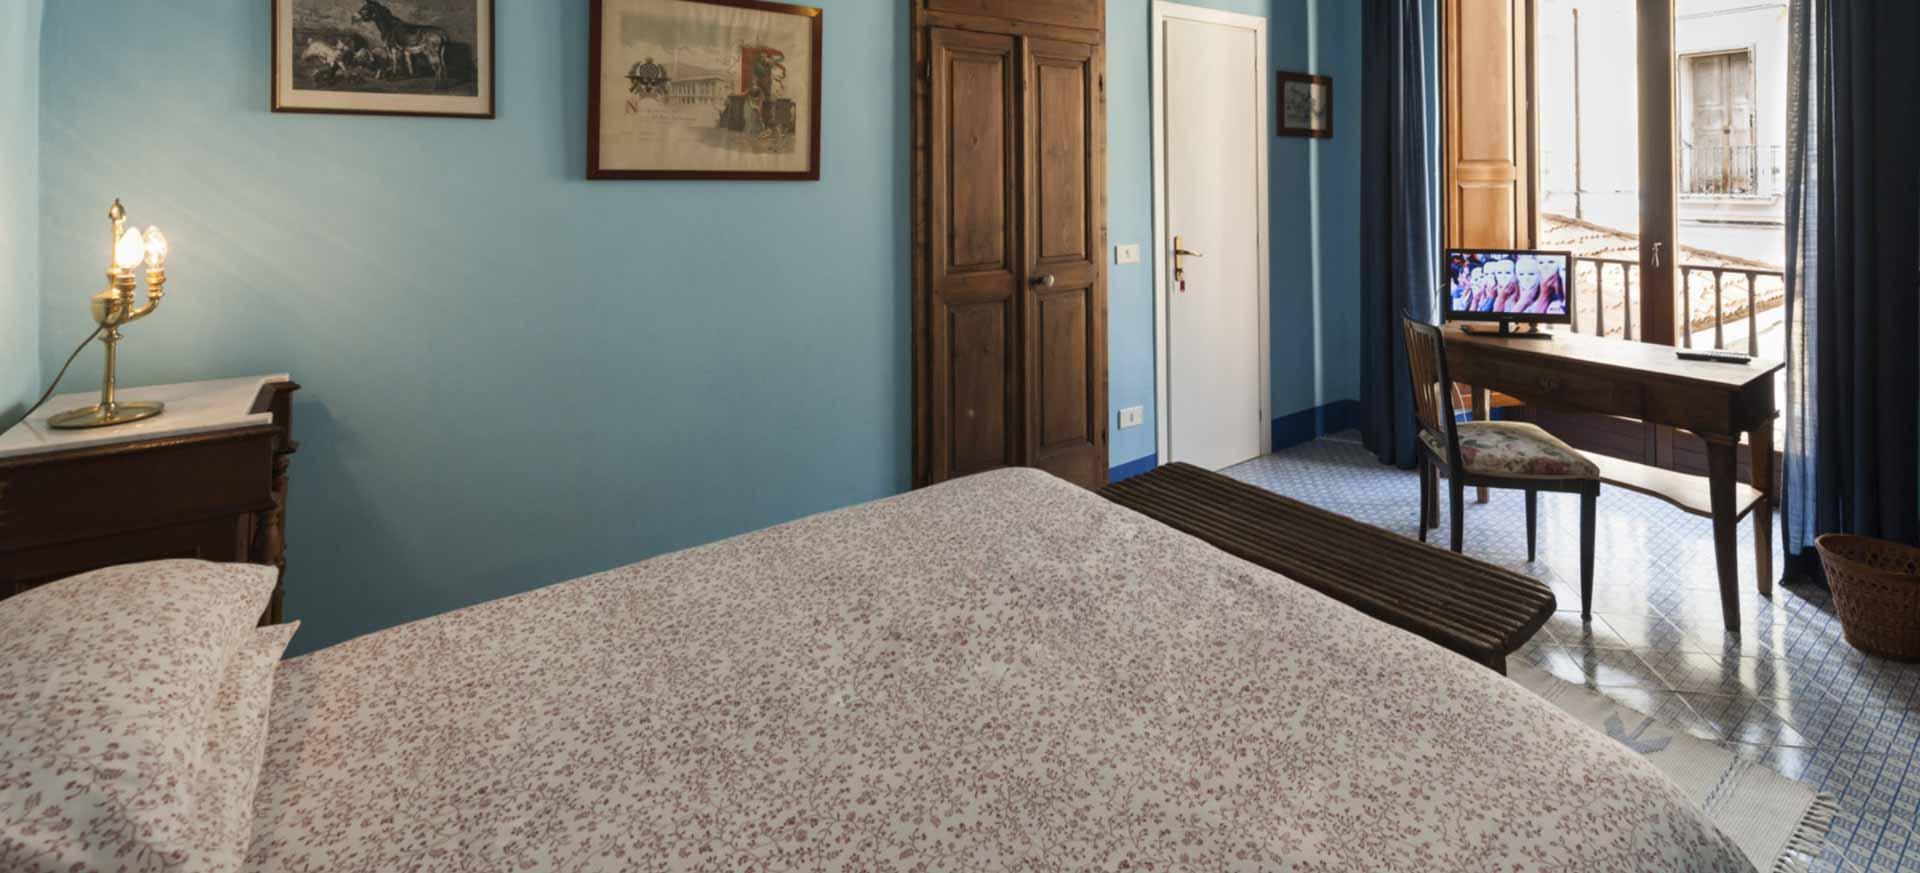 chambre d 39 h te venafro molise hote italia. Black Bedroom Furniture Sets. Home Design Ideas